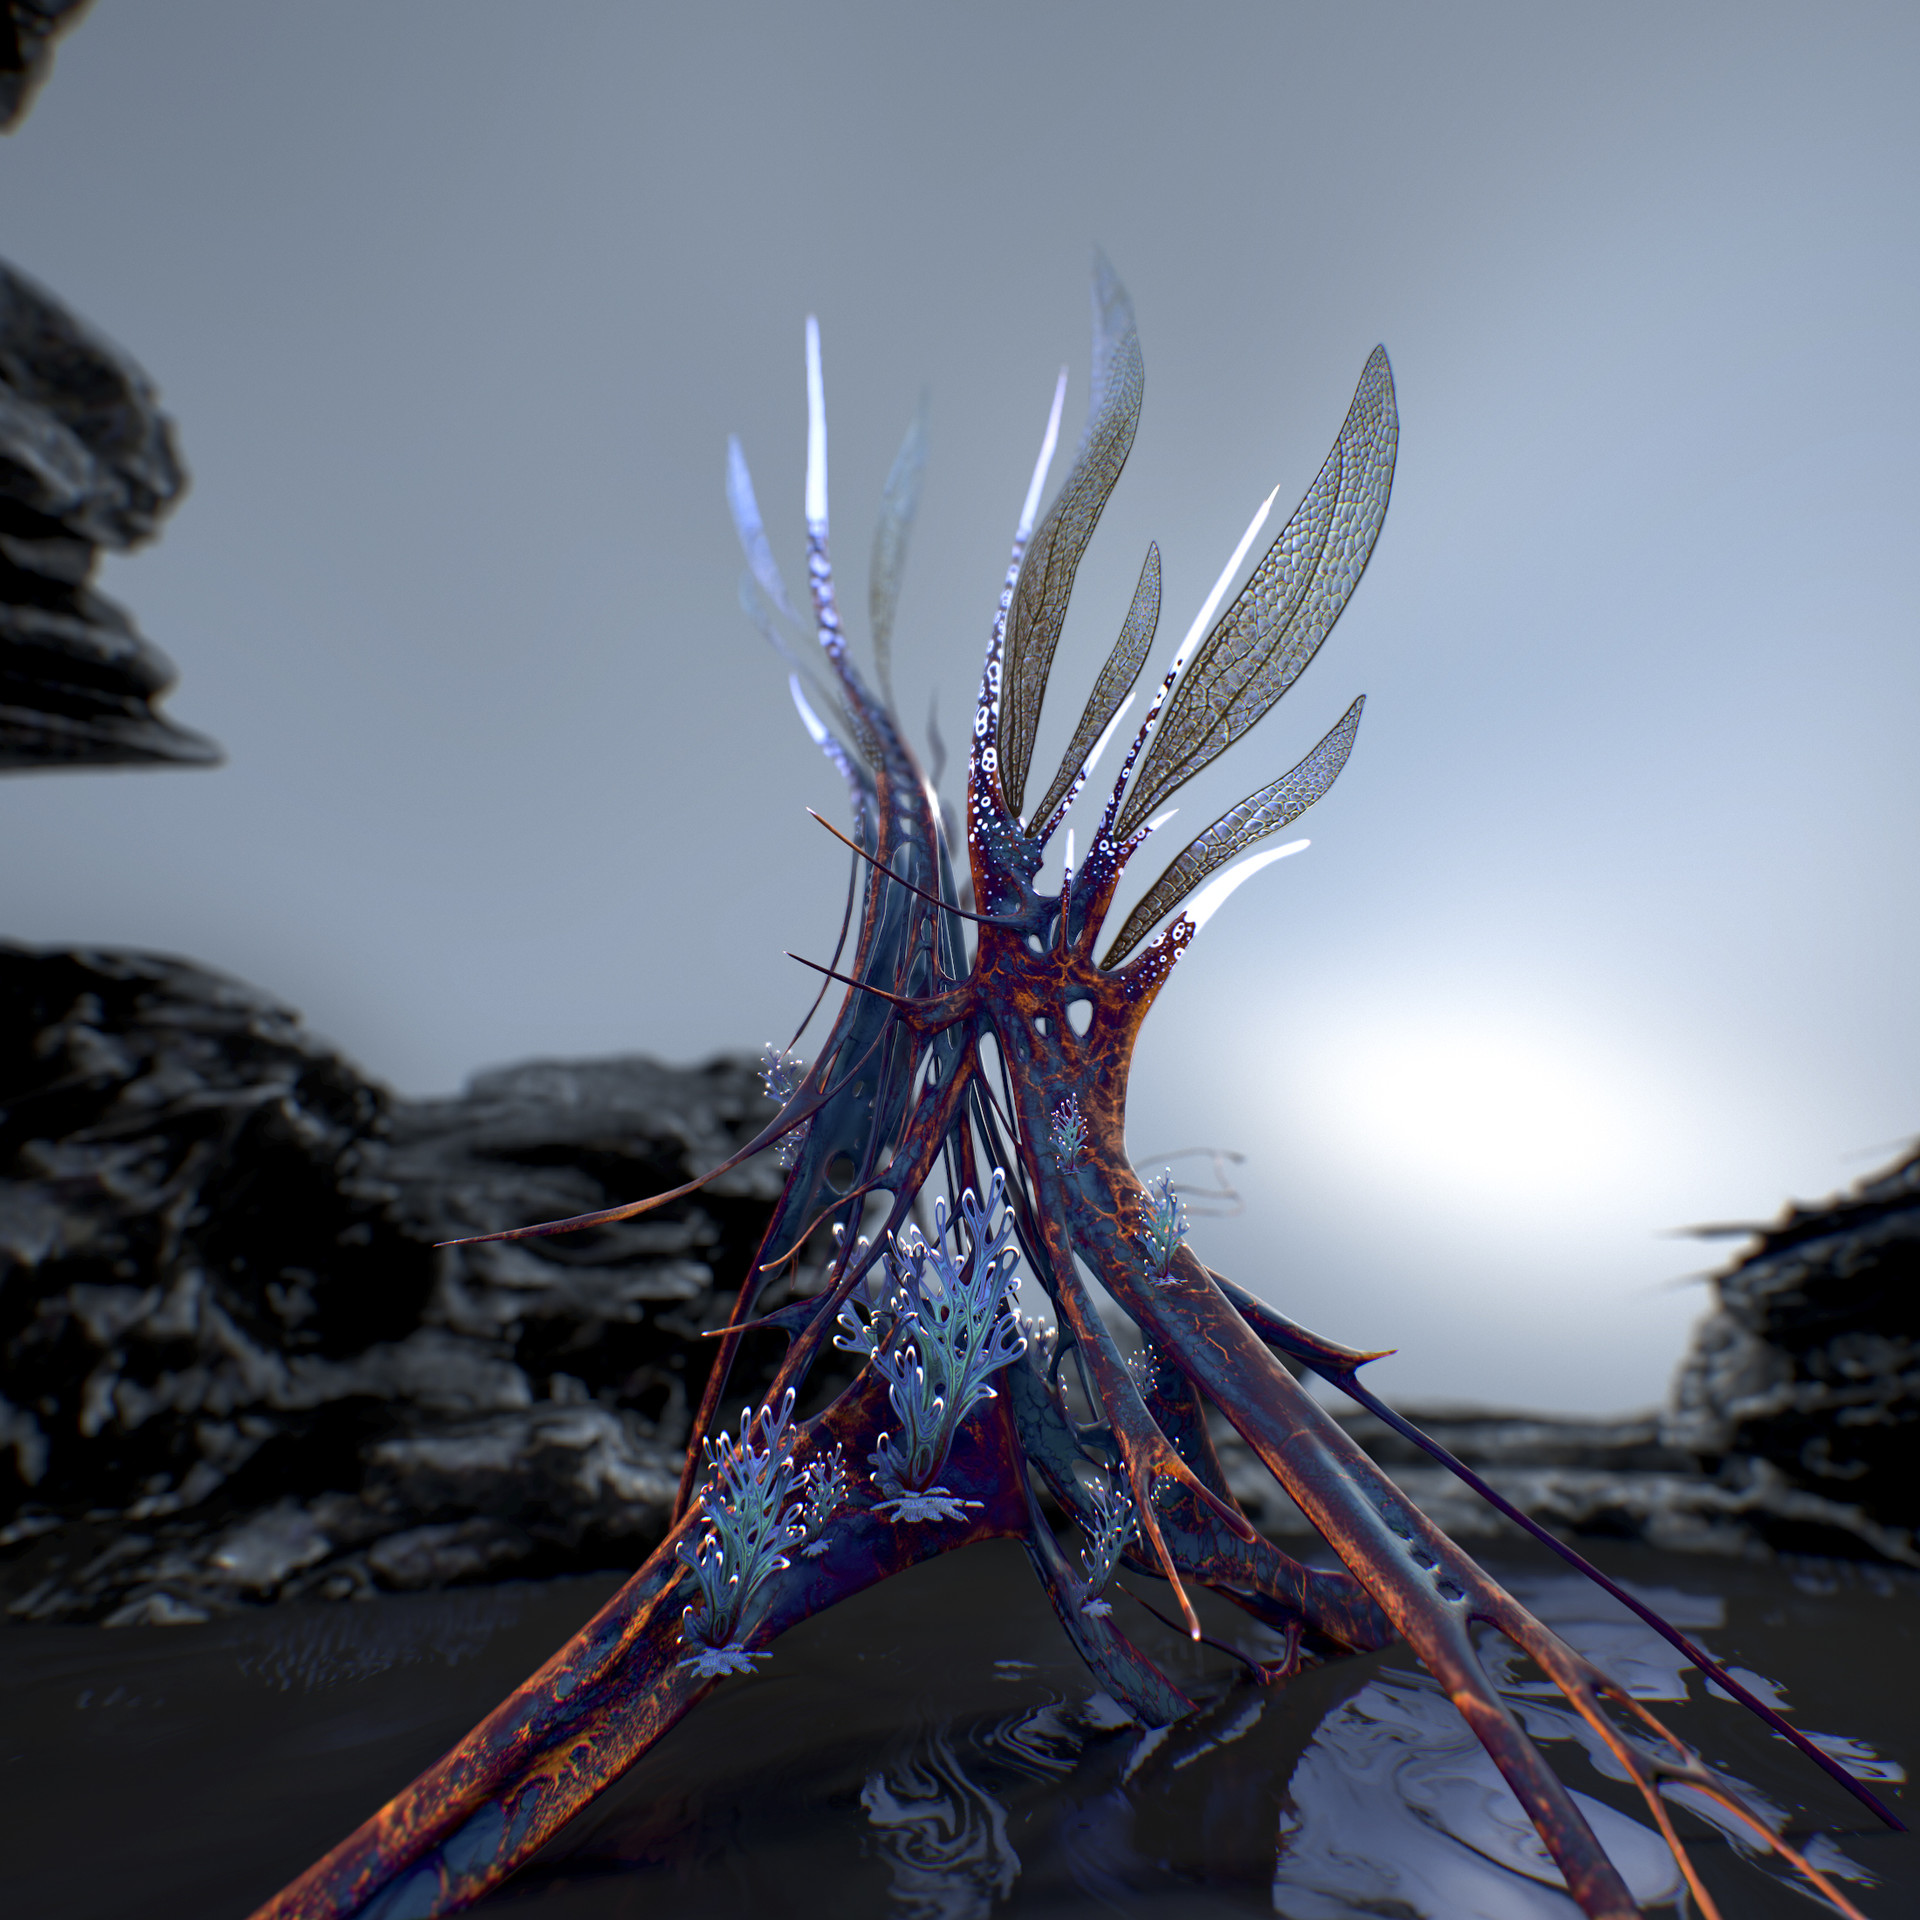 Johan de leenheer alien fern misota spletinus6